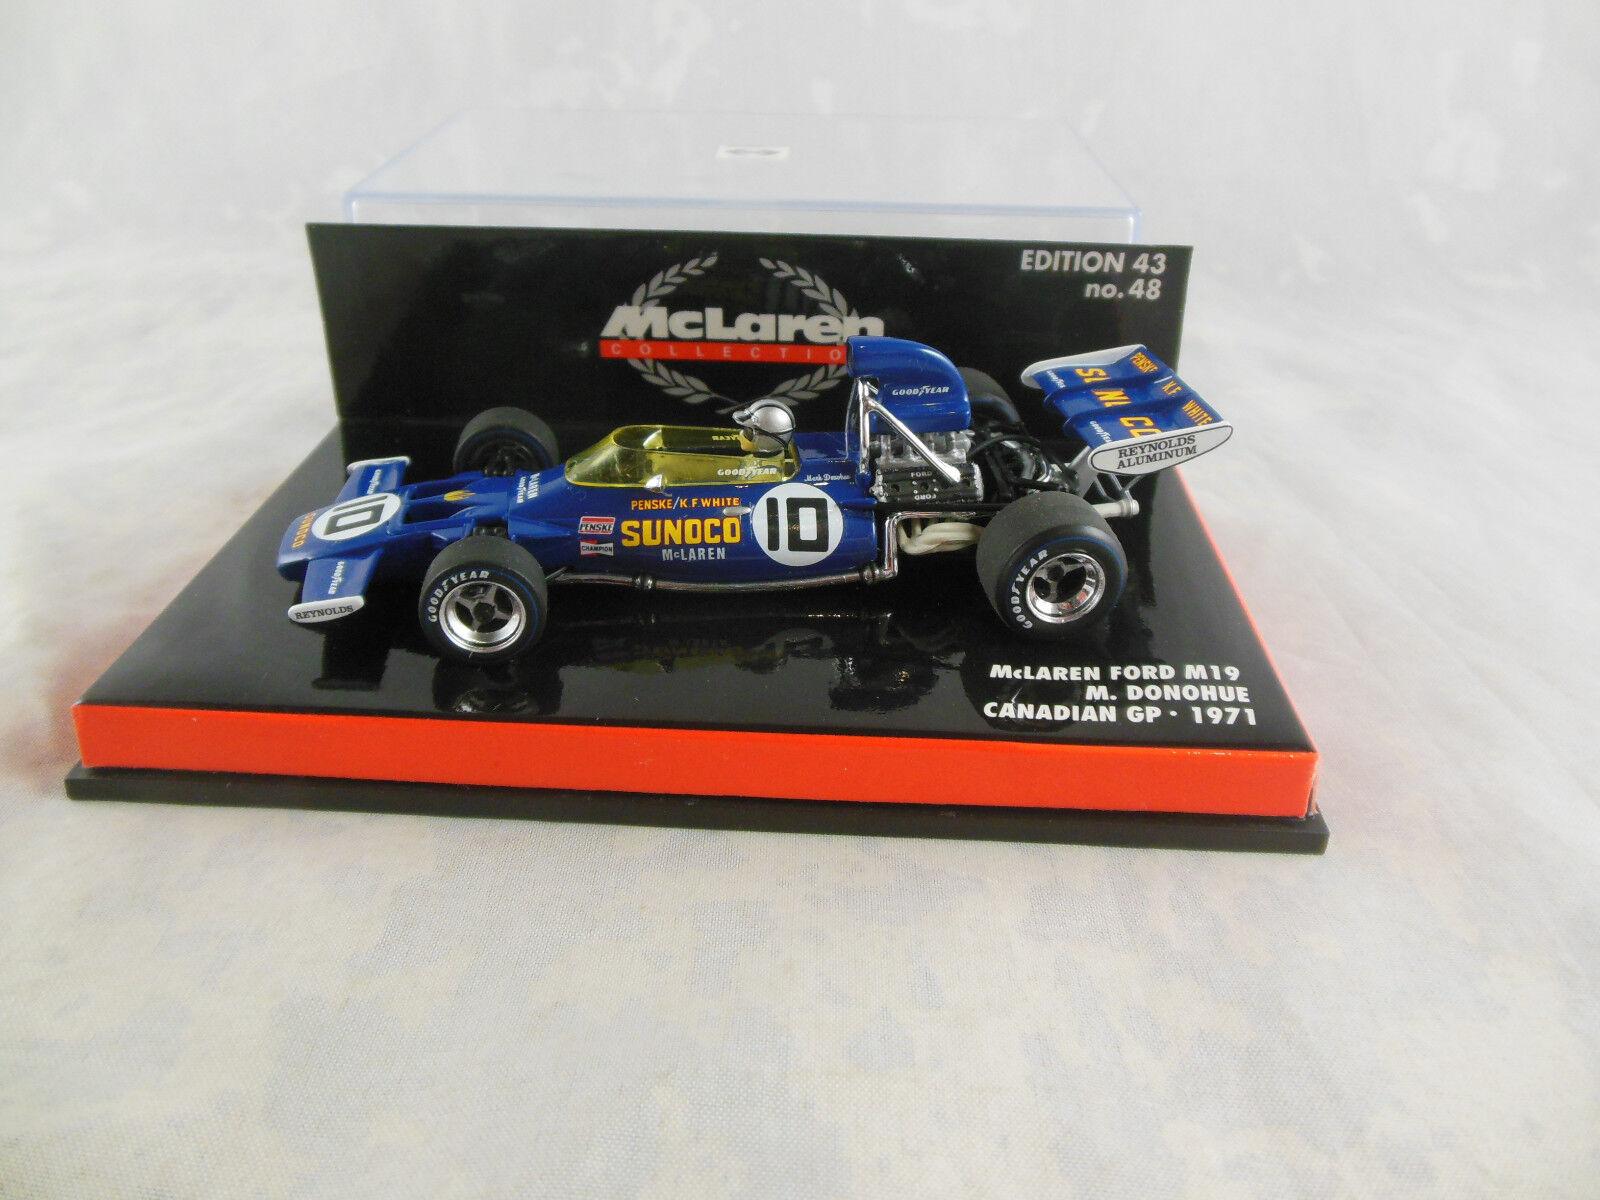 RARE MINICHAMPS 530 714310 1971 McLaren Ford M19 M Donohue Racing No10 Sunoco